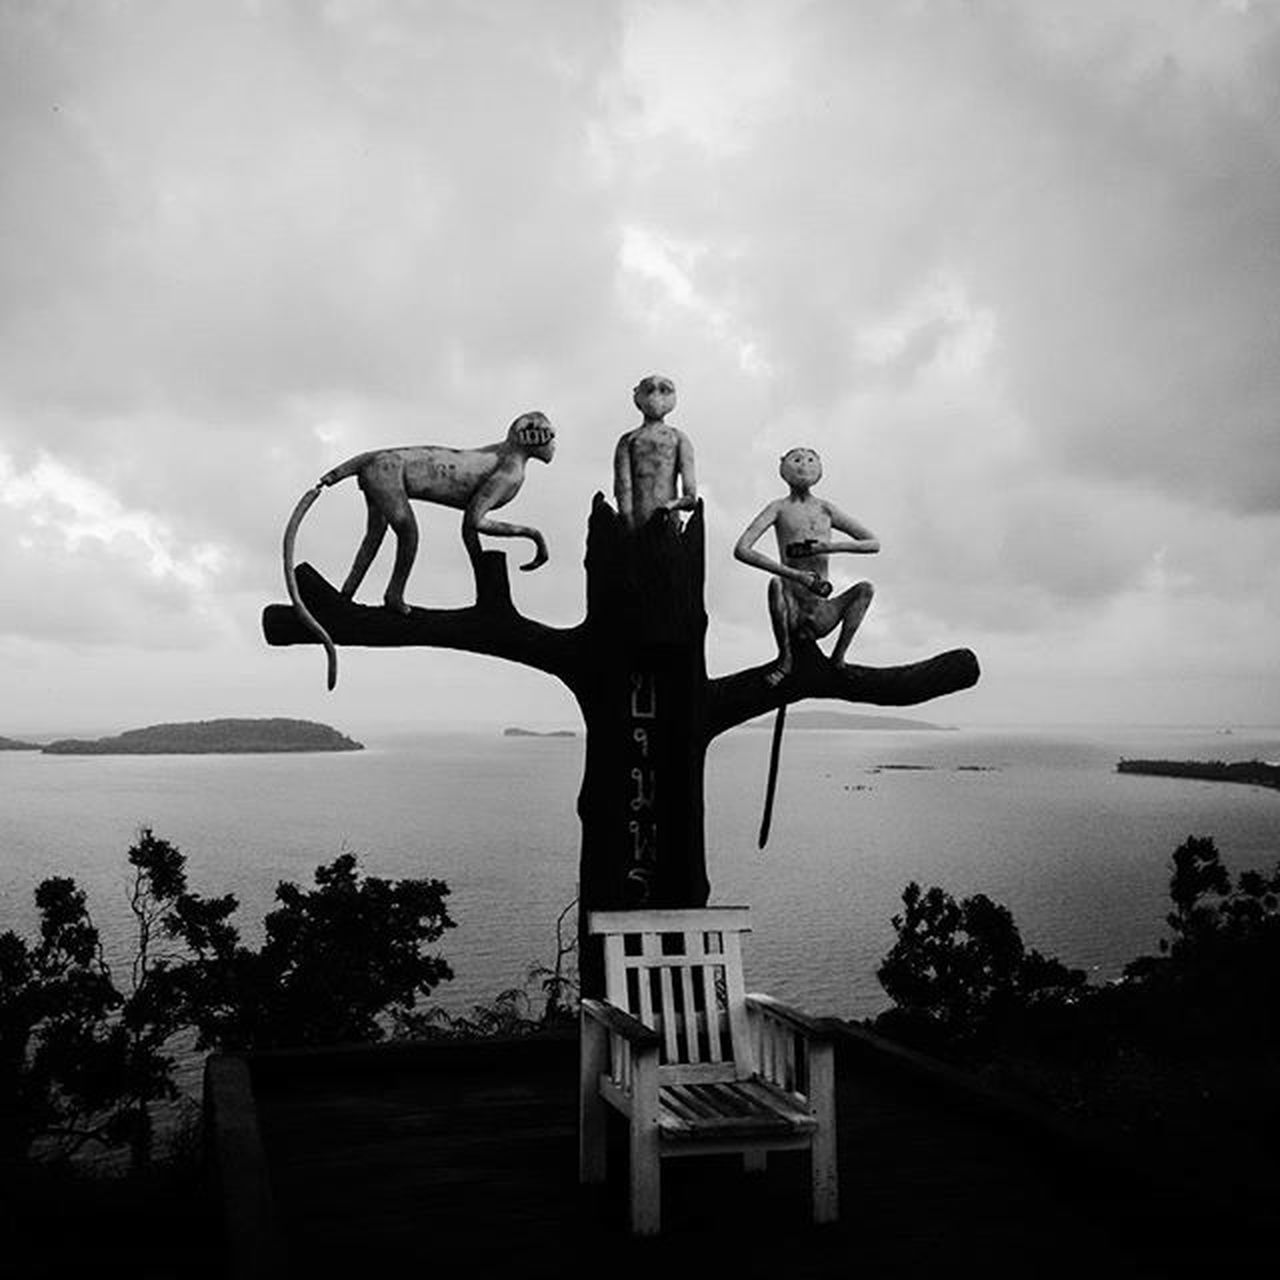 Threemonkeys @ Viewpoint near Hatsairee beach in Paknam Chumphon Thailand ThousandMilesJourney.com ASIA Thailandphoto Statues Travelaroundtheworld Bwphoto Landscapes